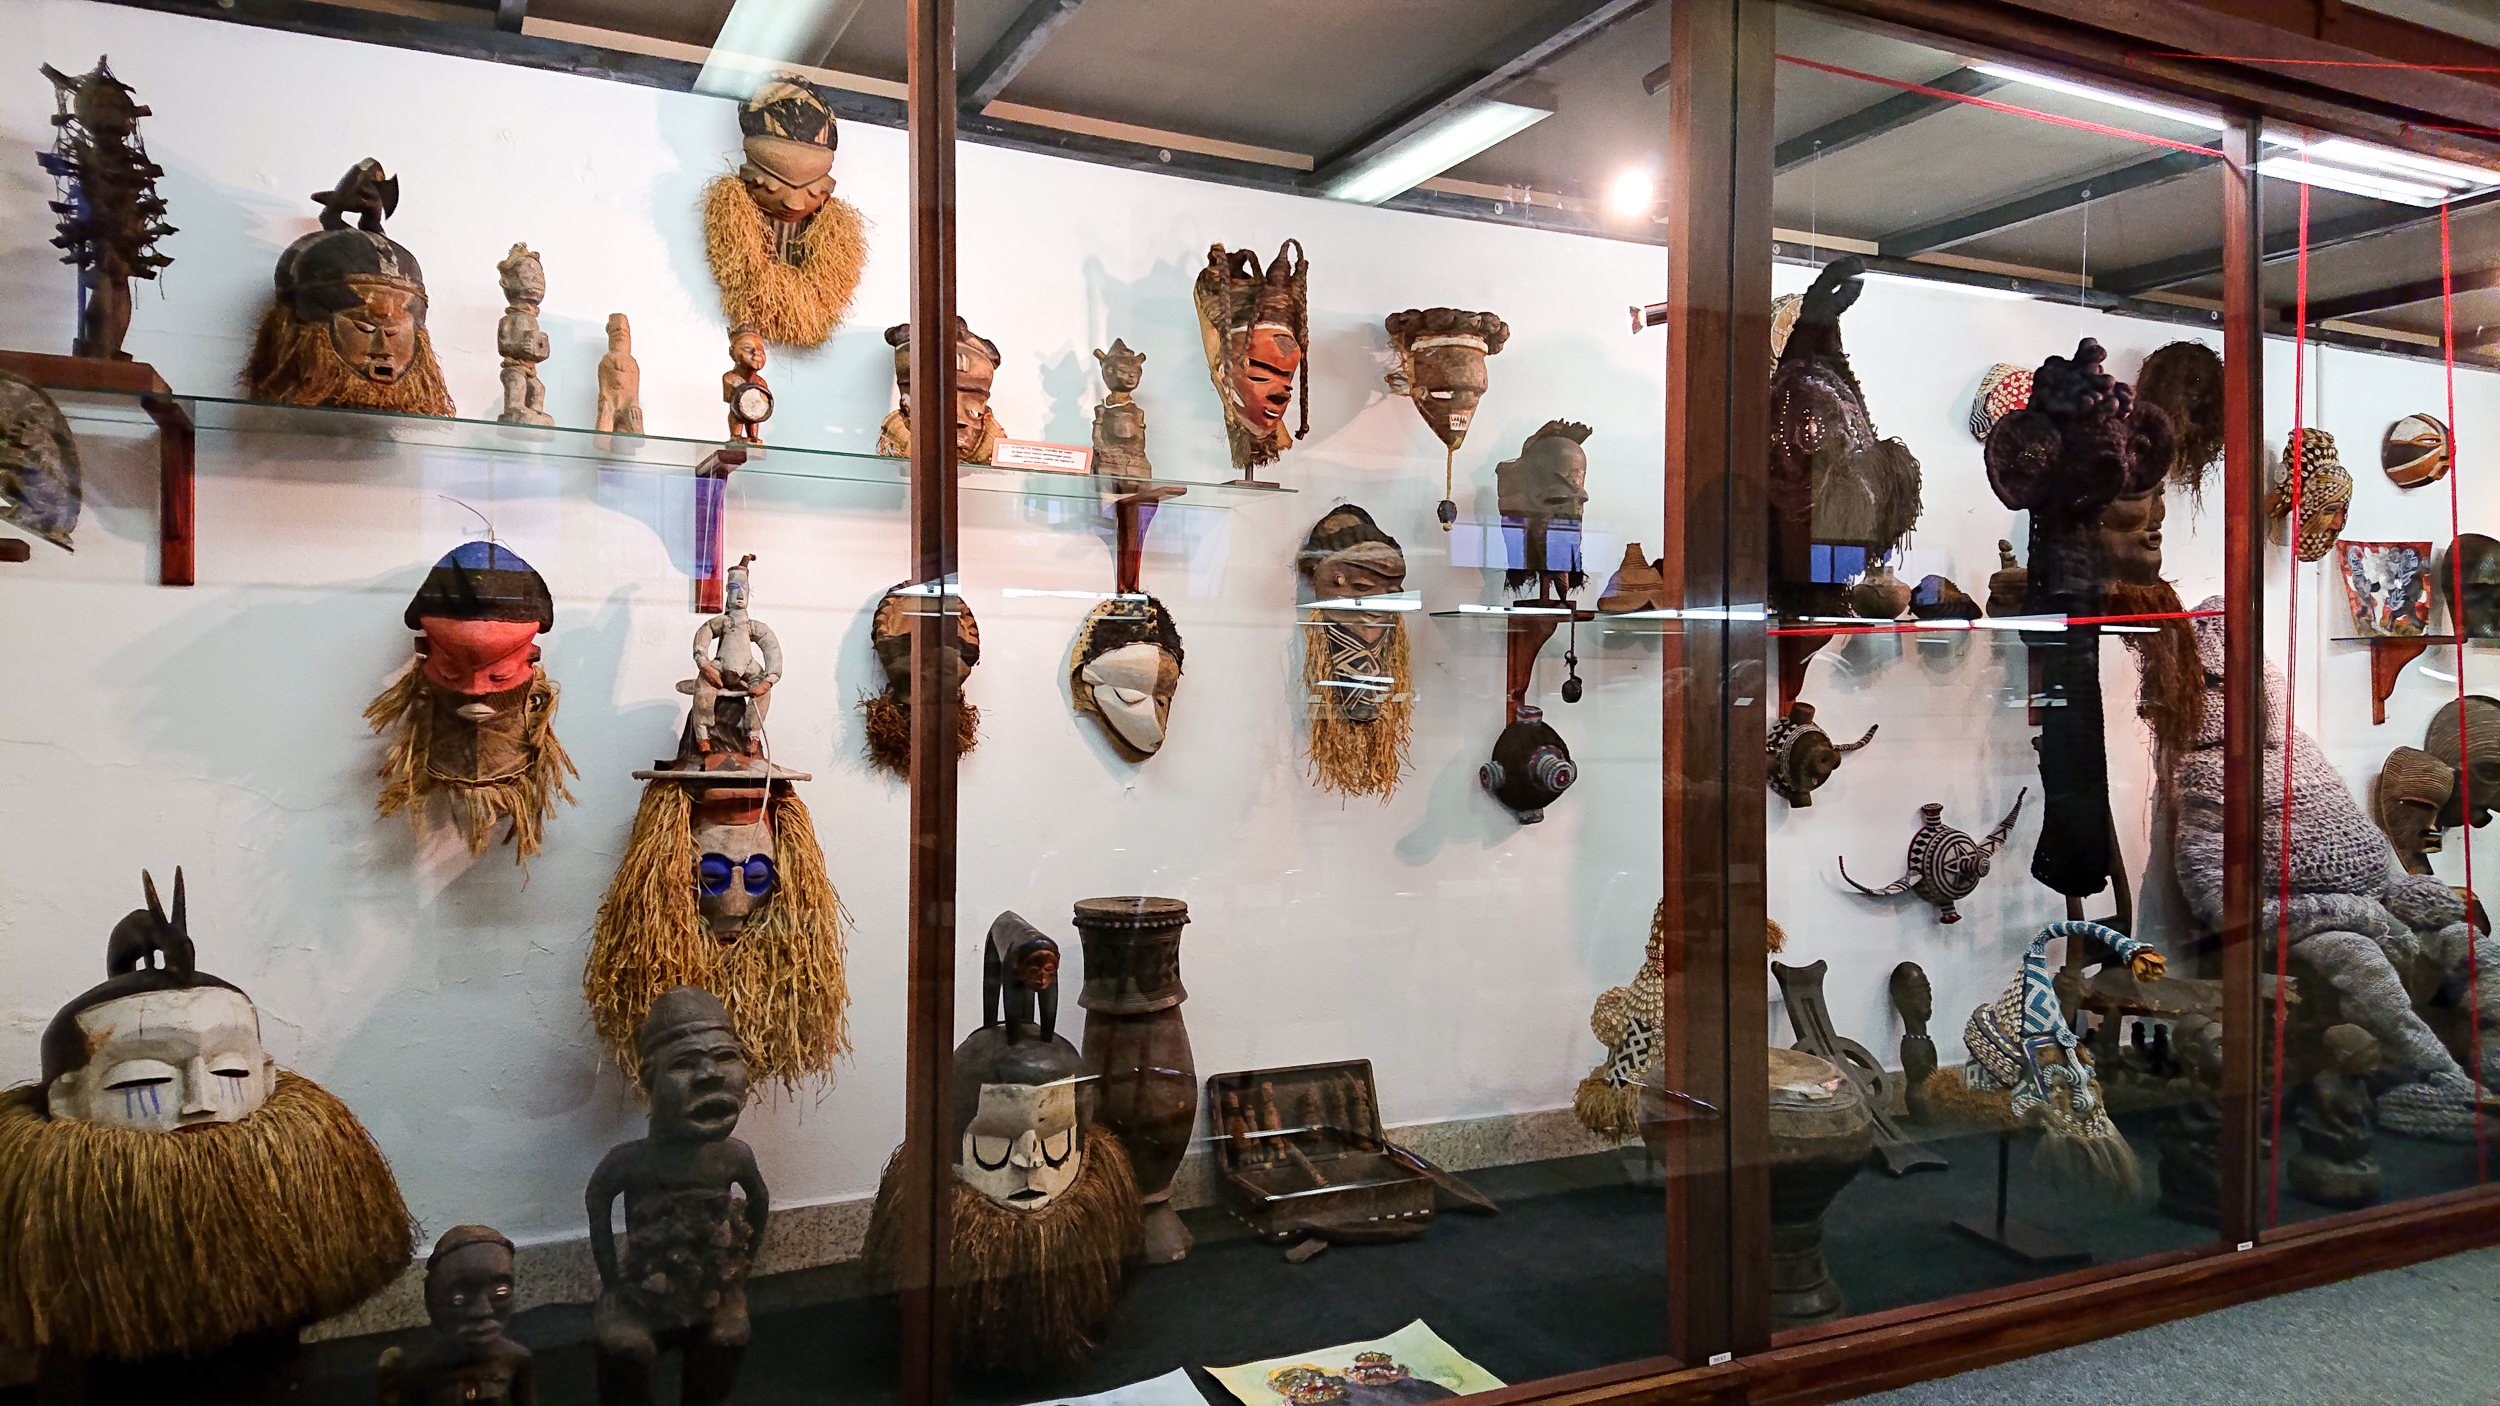 Divers masques africains. Pende, Yaka, Suku, Ngeendé, Luba, Kongo, Chokwe : autant d'ethnies représentées.